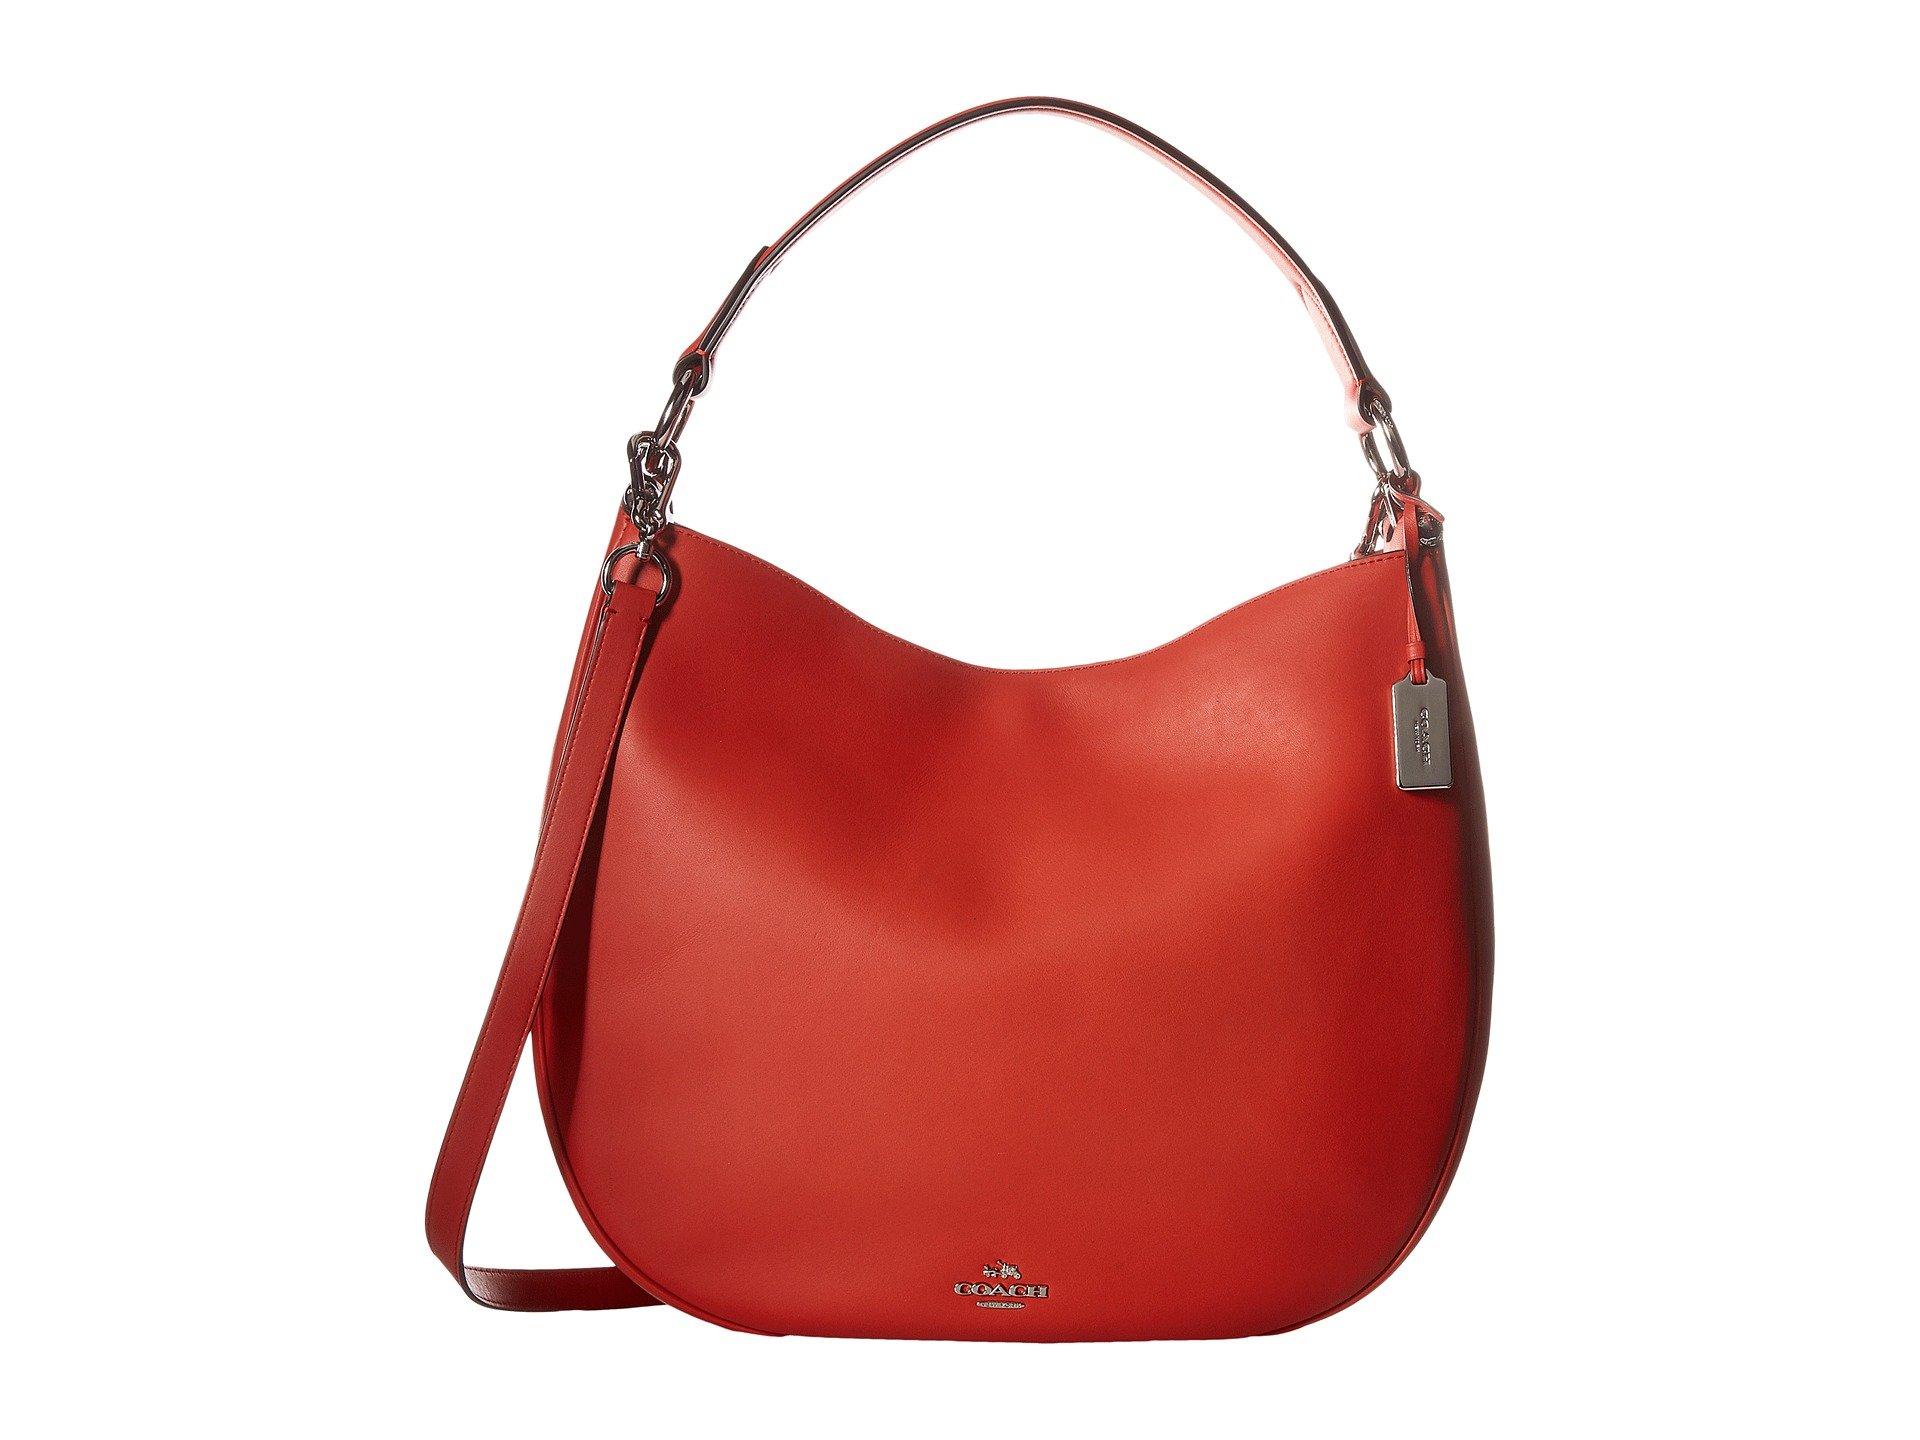 COACH Women's Glovetan Leather Nomad Hobo Sv/Carmine Handbag by Coach